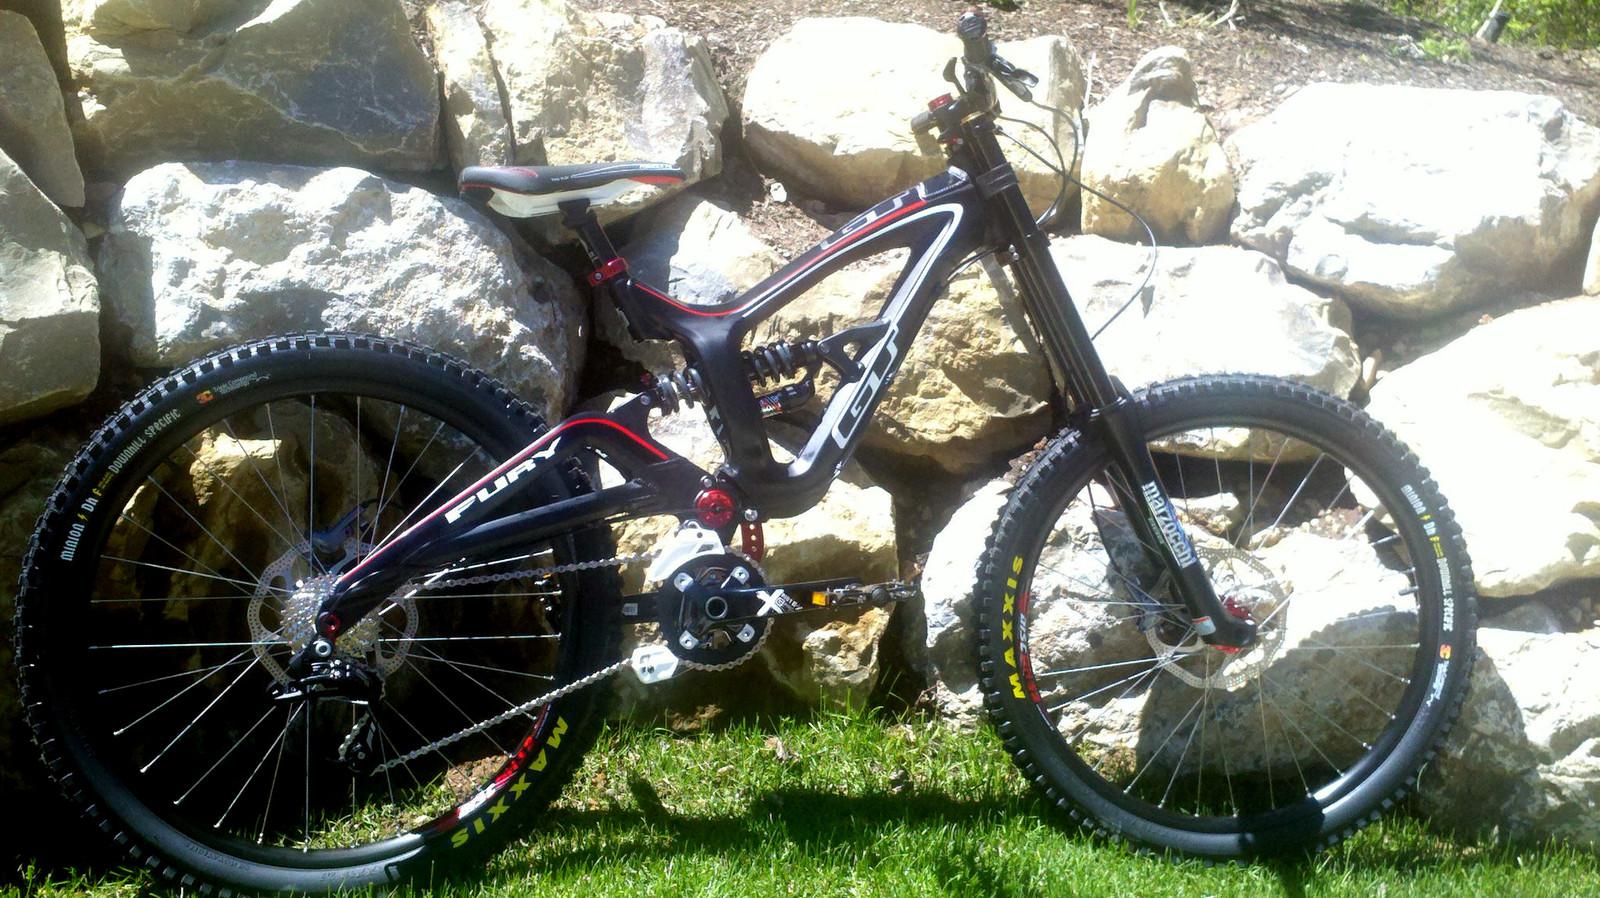 2012 GT Alloy Fury - 2012 Prototypes and Sneak Peaks - Mountain Biking Pictures - Vital MTB